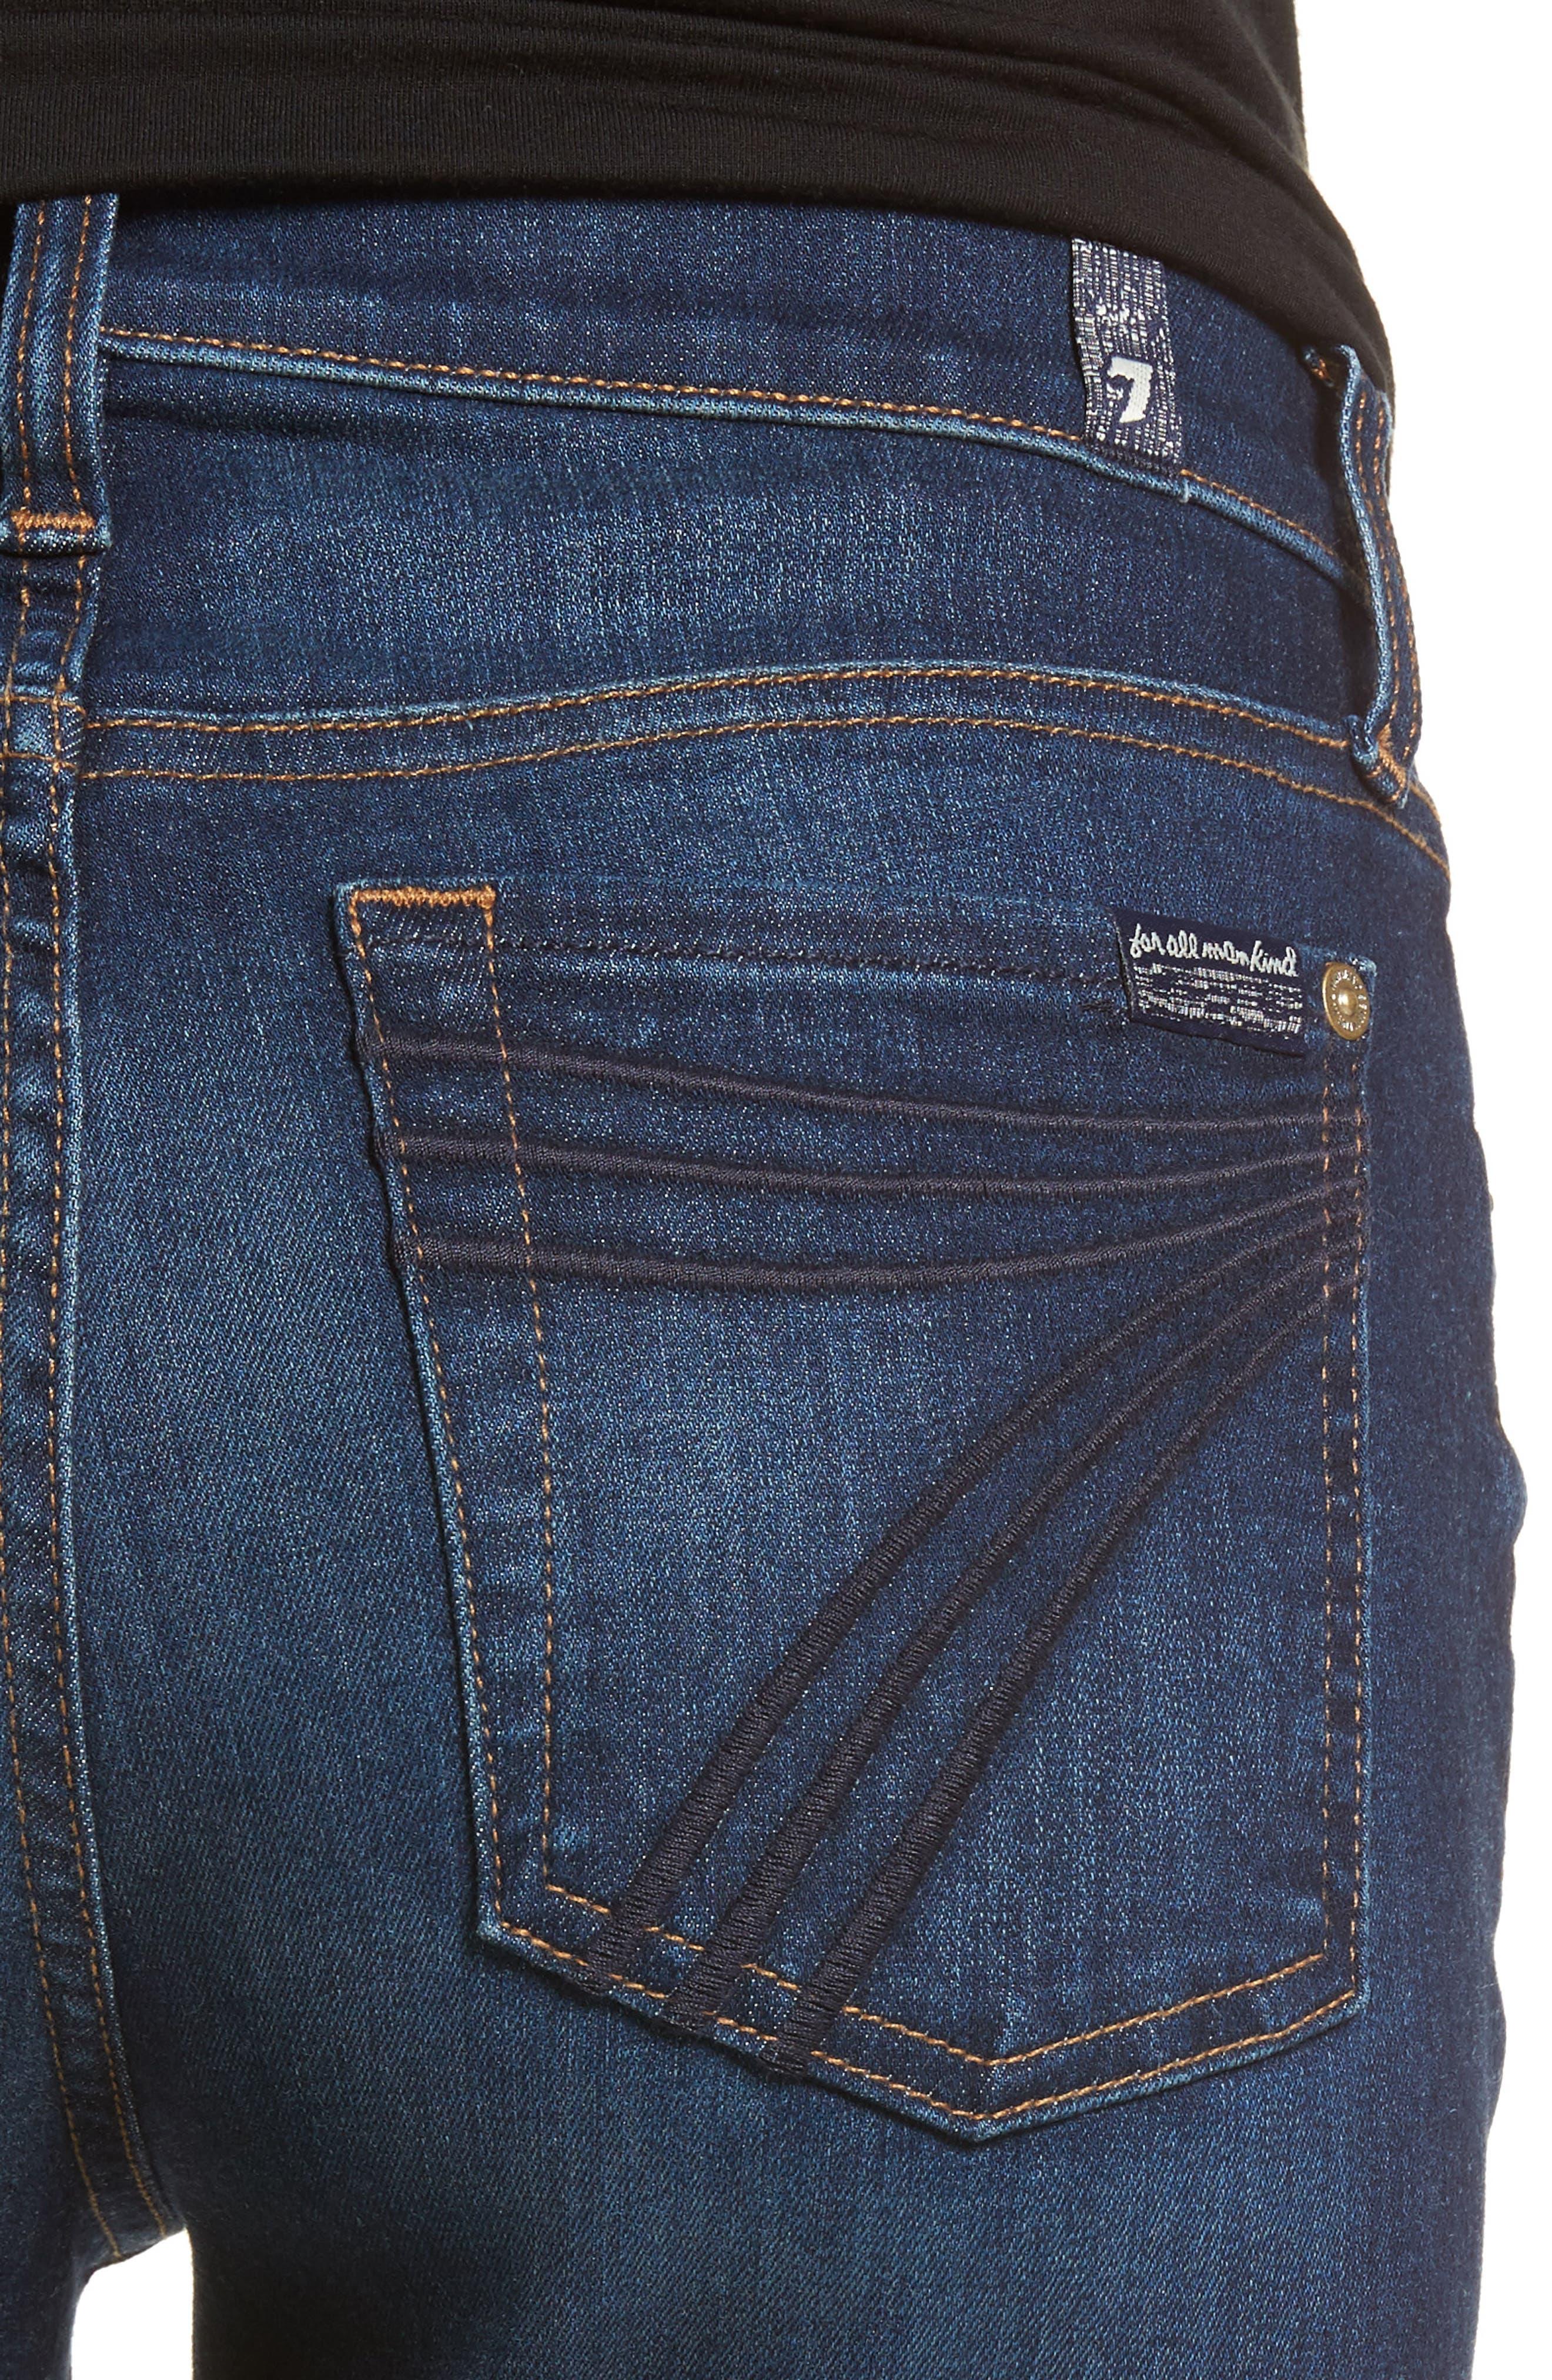 Dojo Wide Leg Jeans,                             Alternate thumbnail 4, color,                             MORENO